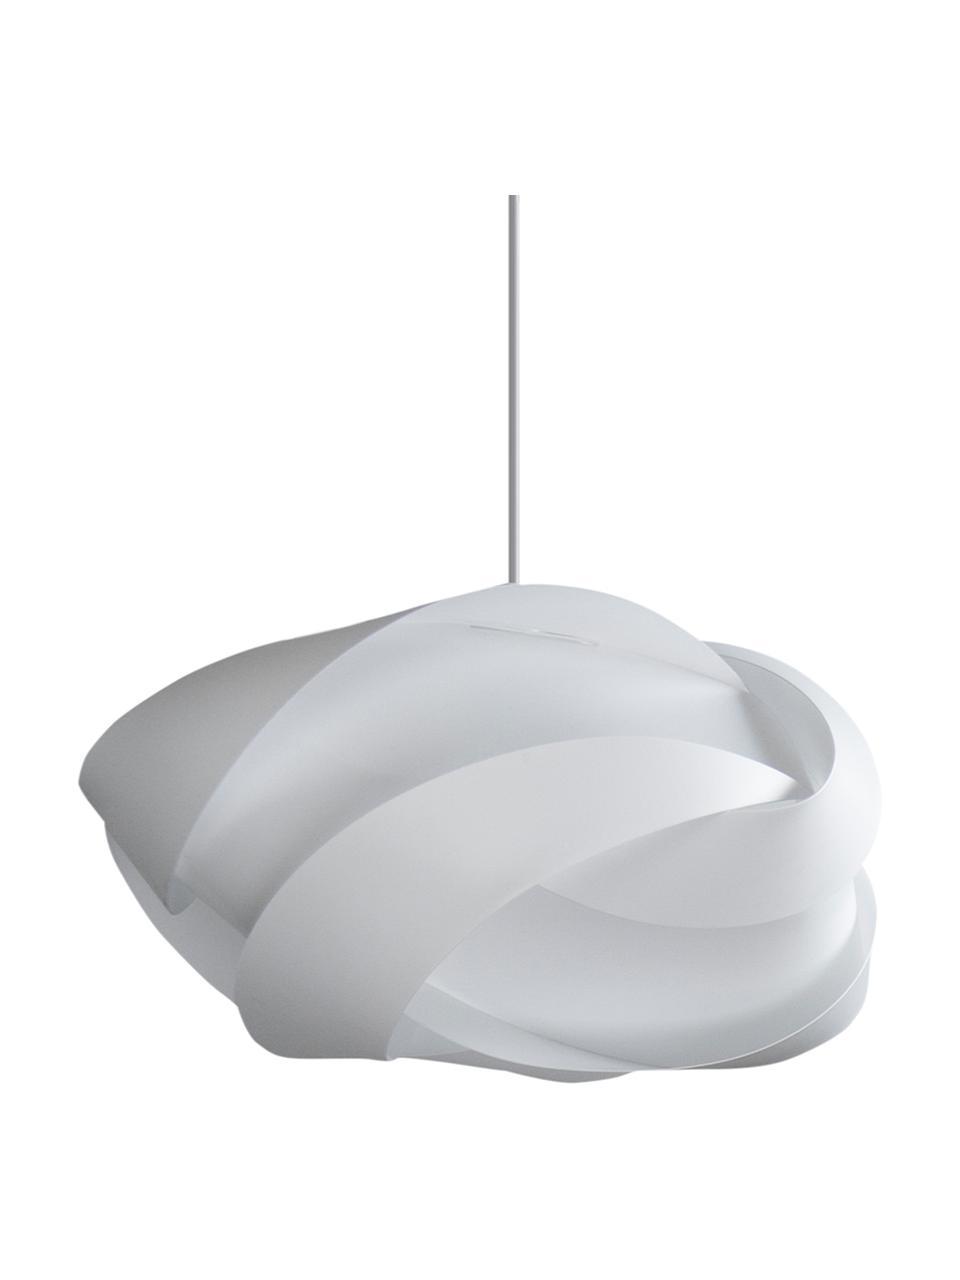 Lampada a sospensione Ribbon, Paralume: polipropilene, policarbon, Baldacchino: materiale sintetico, Bianco, Ø 60 x Alt. 28 cm